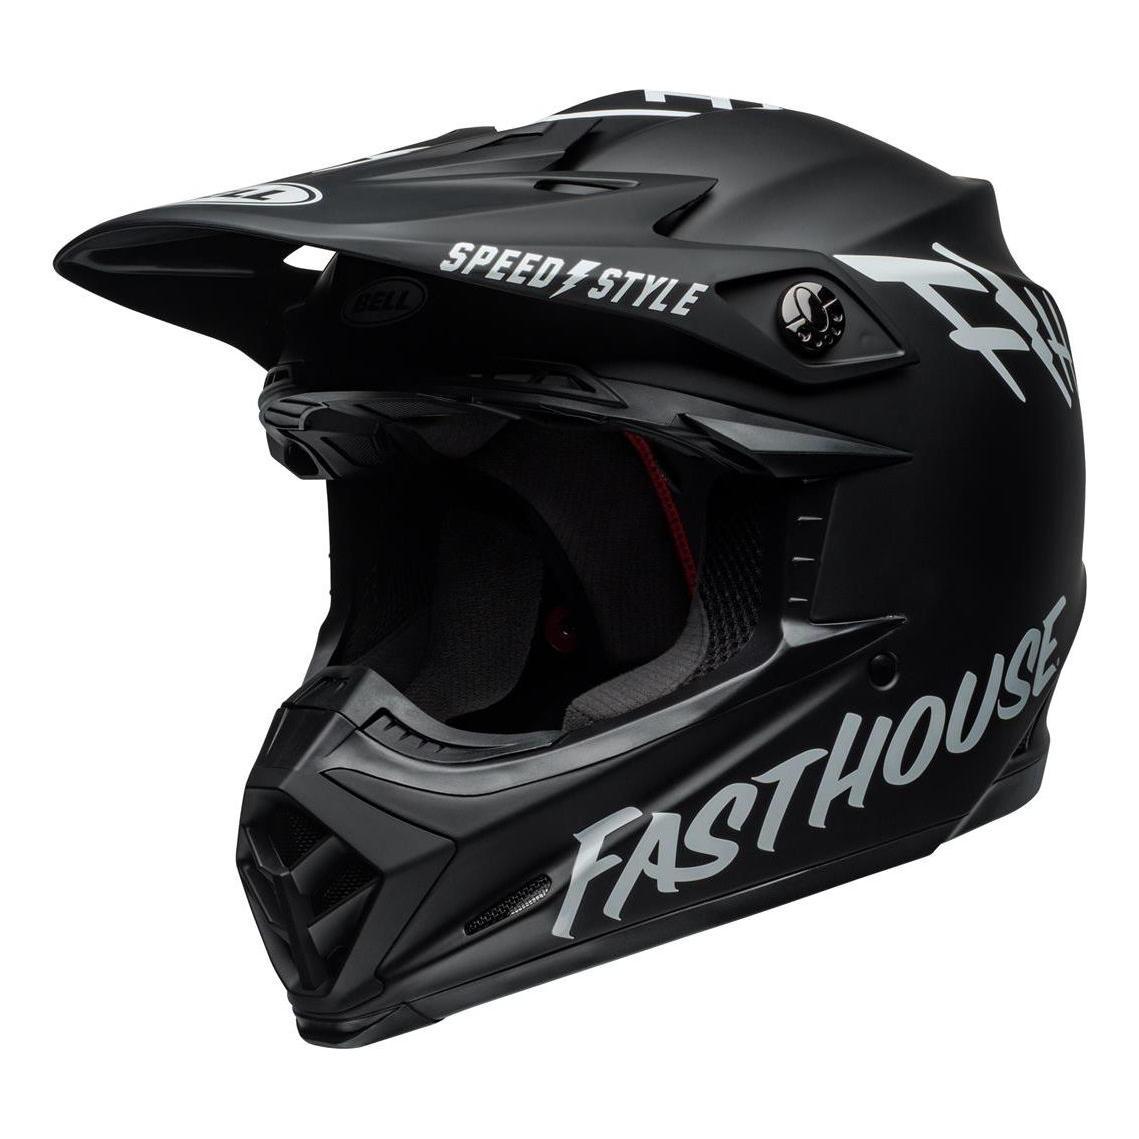 Casque cross Bell Moto-9 Mips Fasthouse blanc/noir - XS